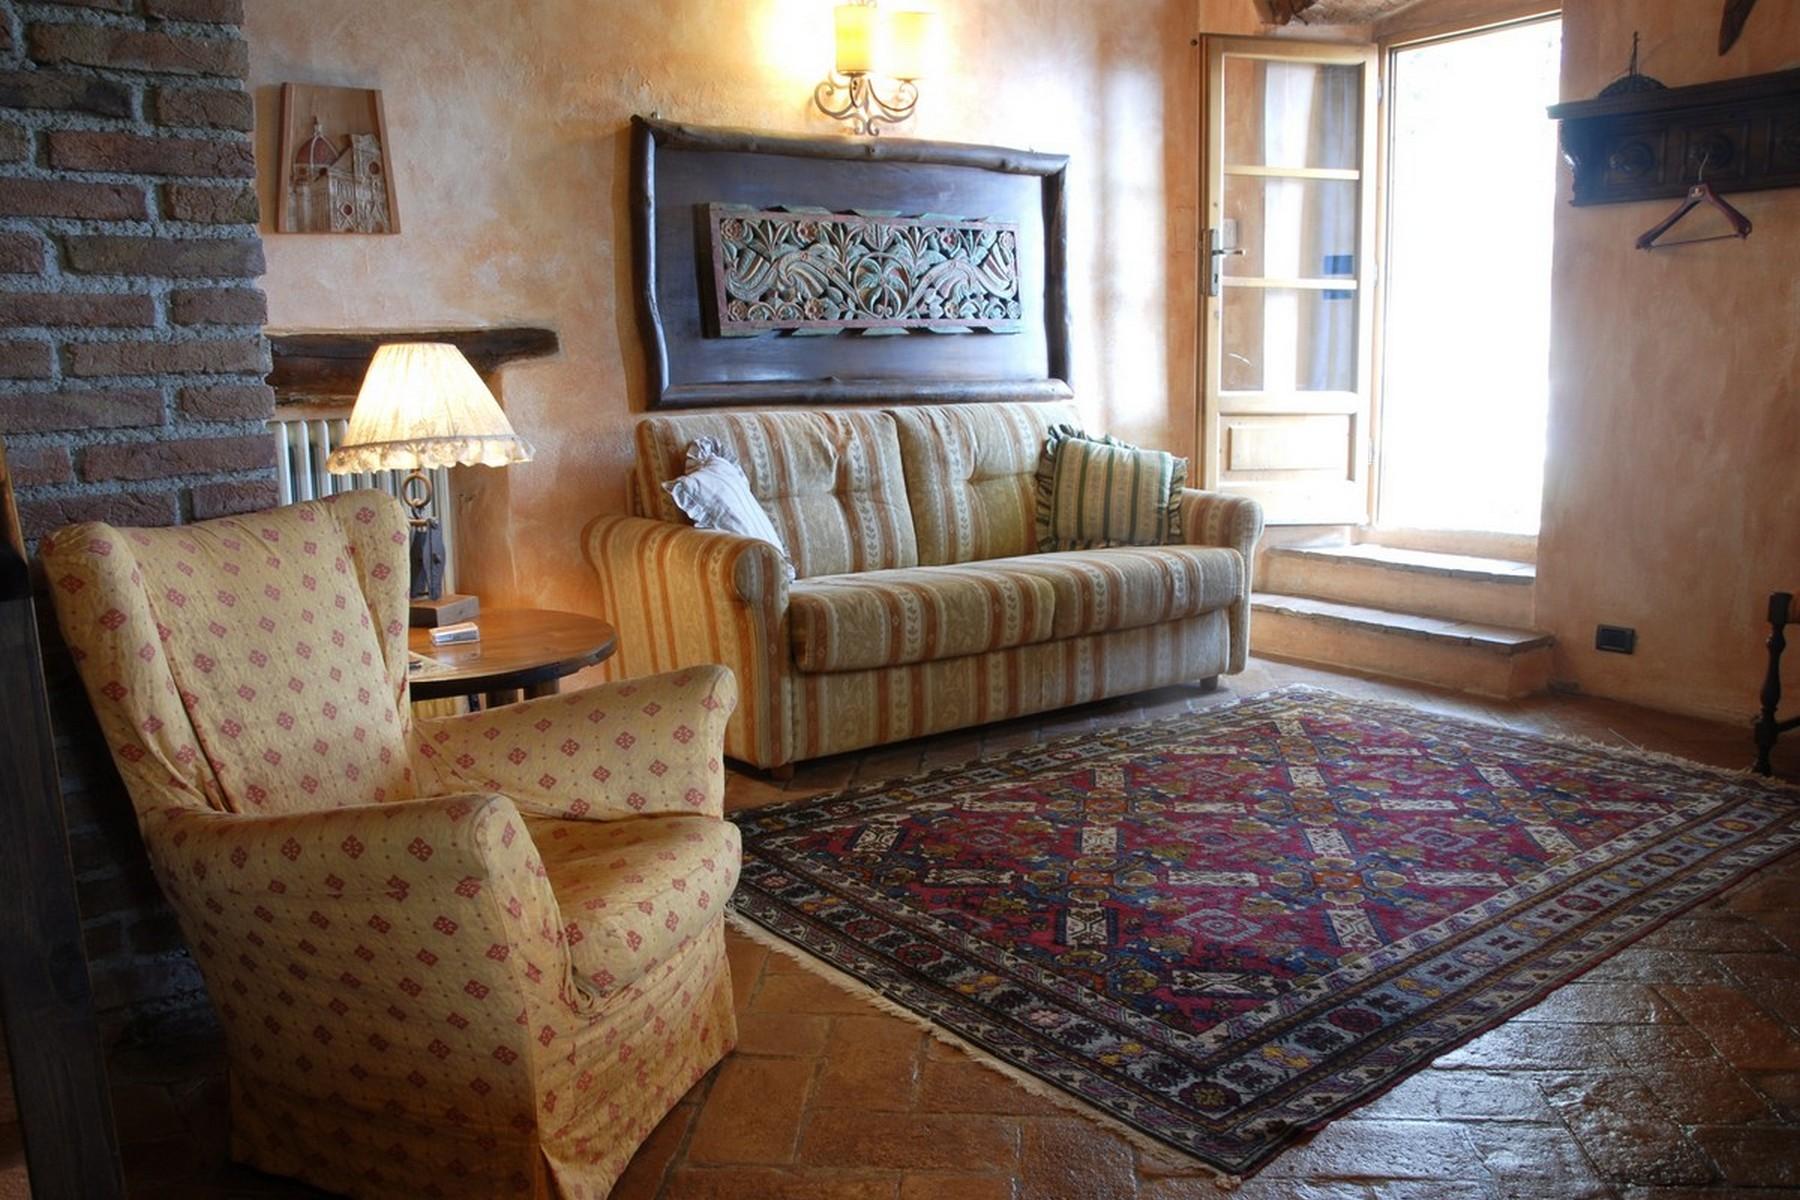 Villa in Vendita a Greve In Chianti: 5 locali, 400 mq - Foto 8